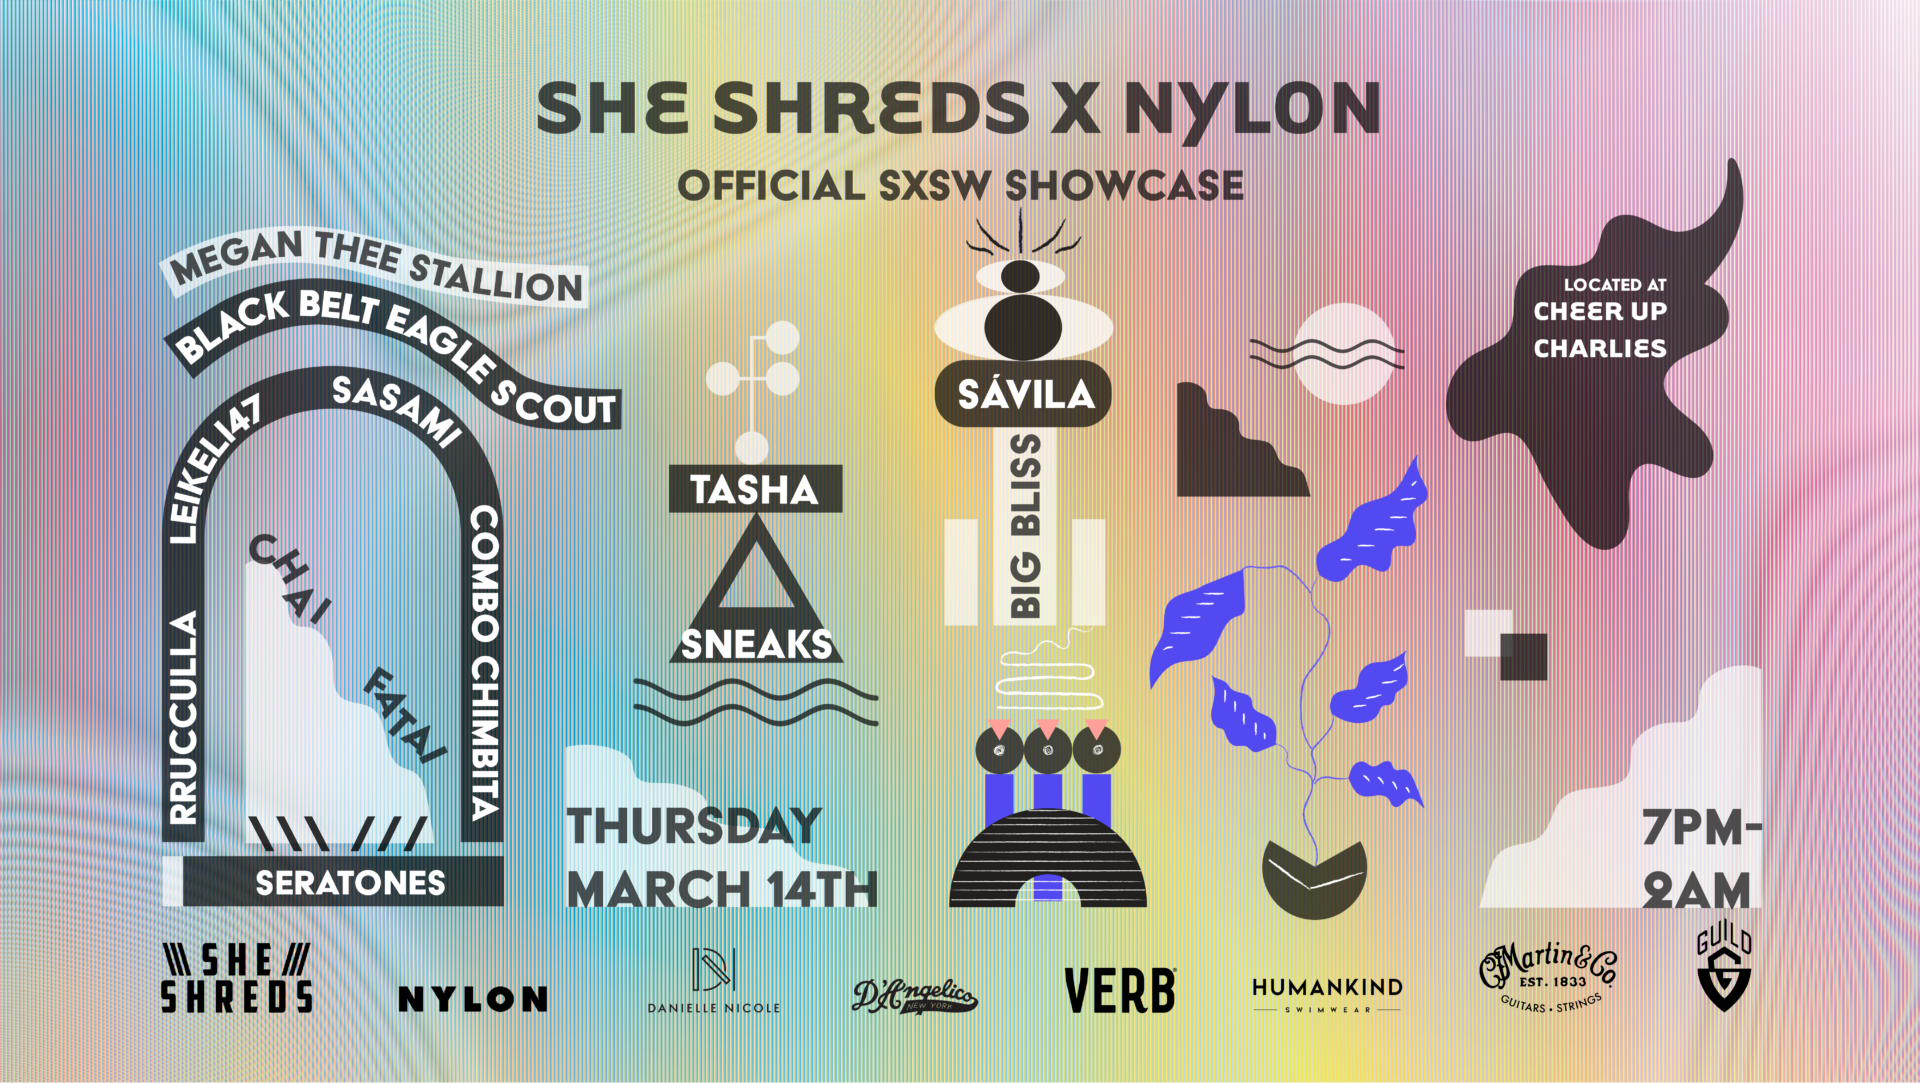 SS X NYLON SXSW Sponor Update v2